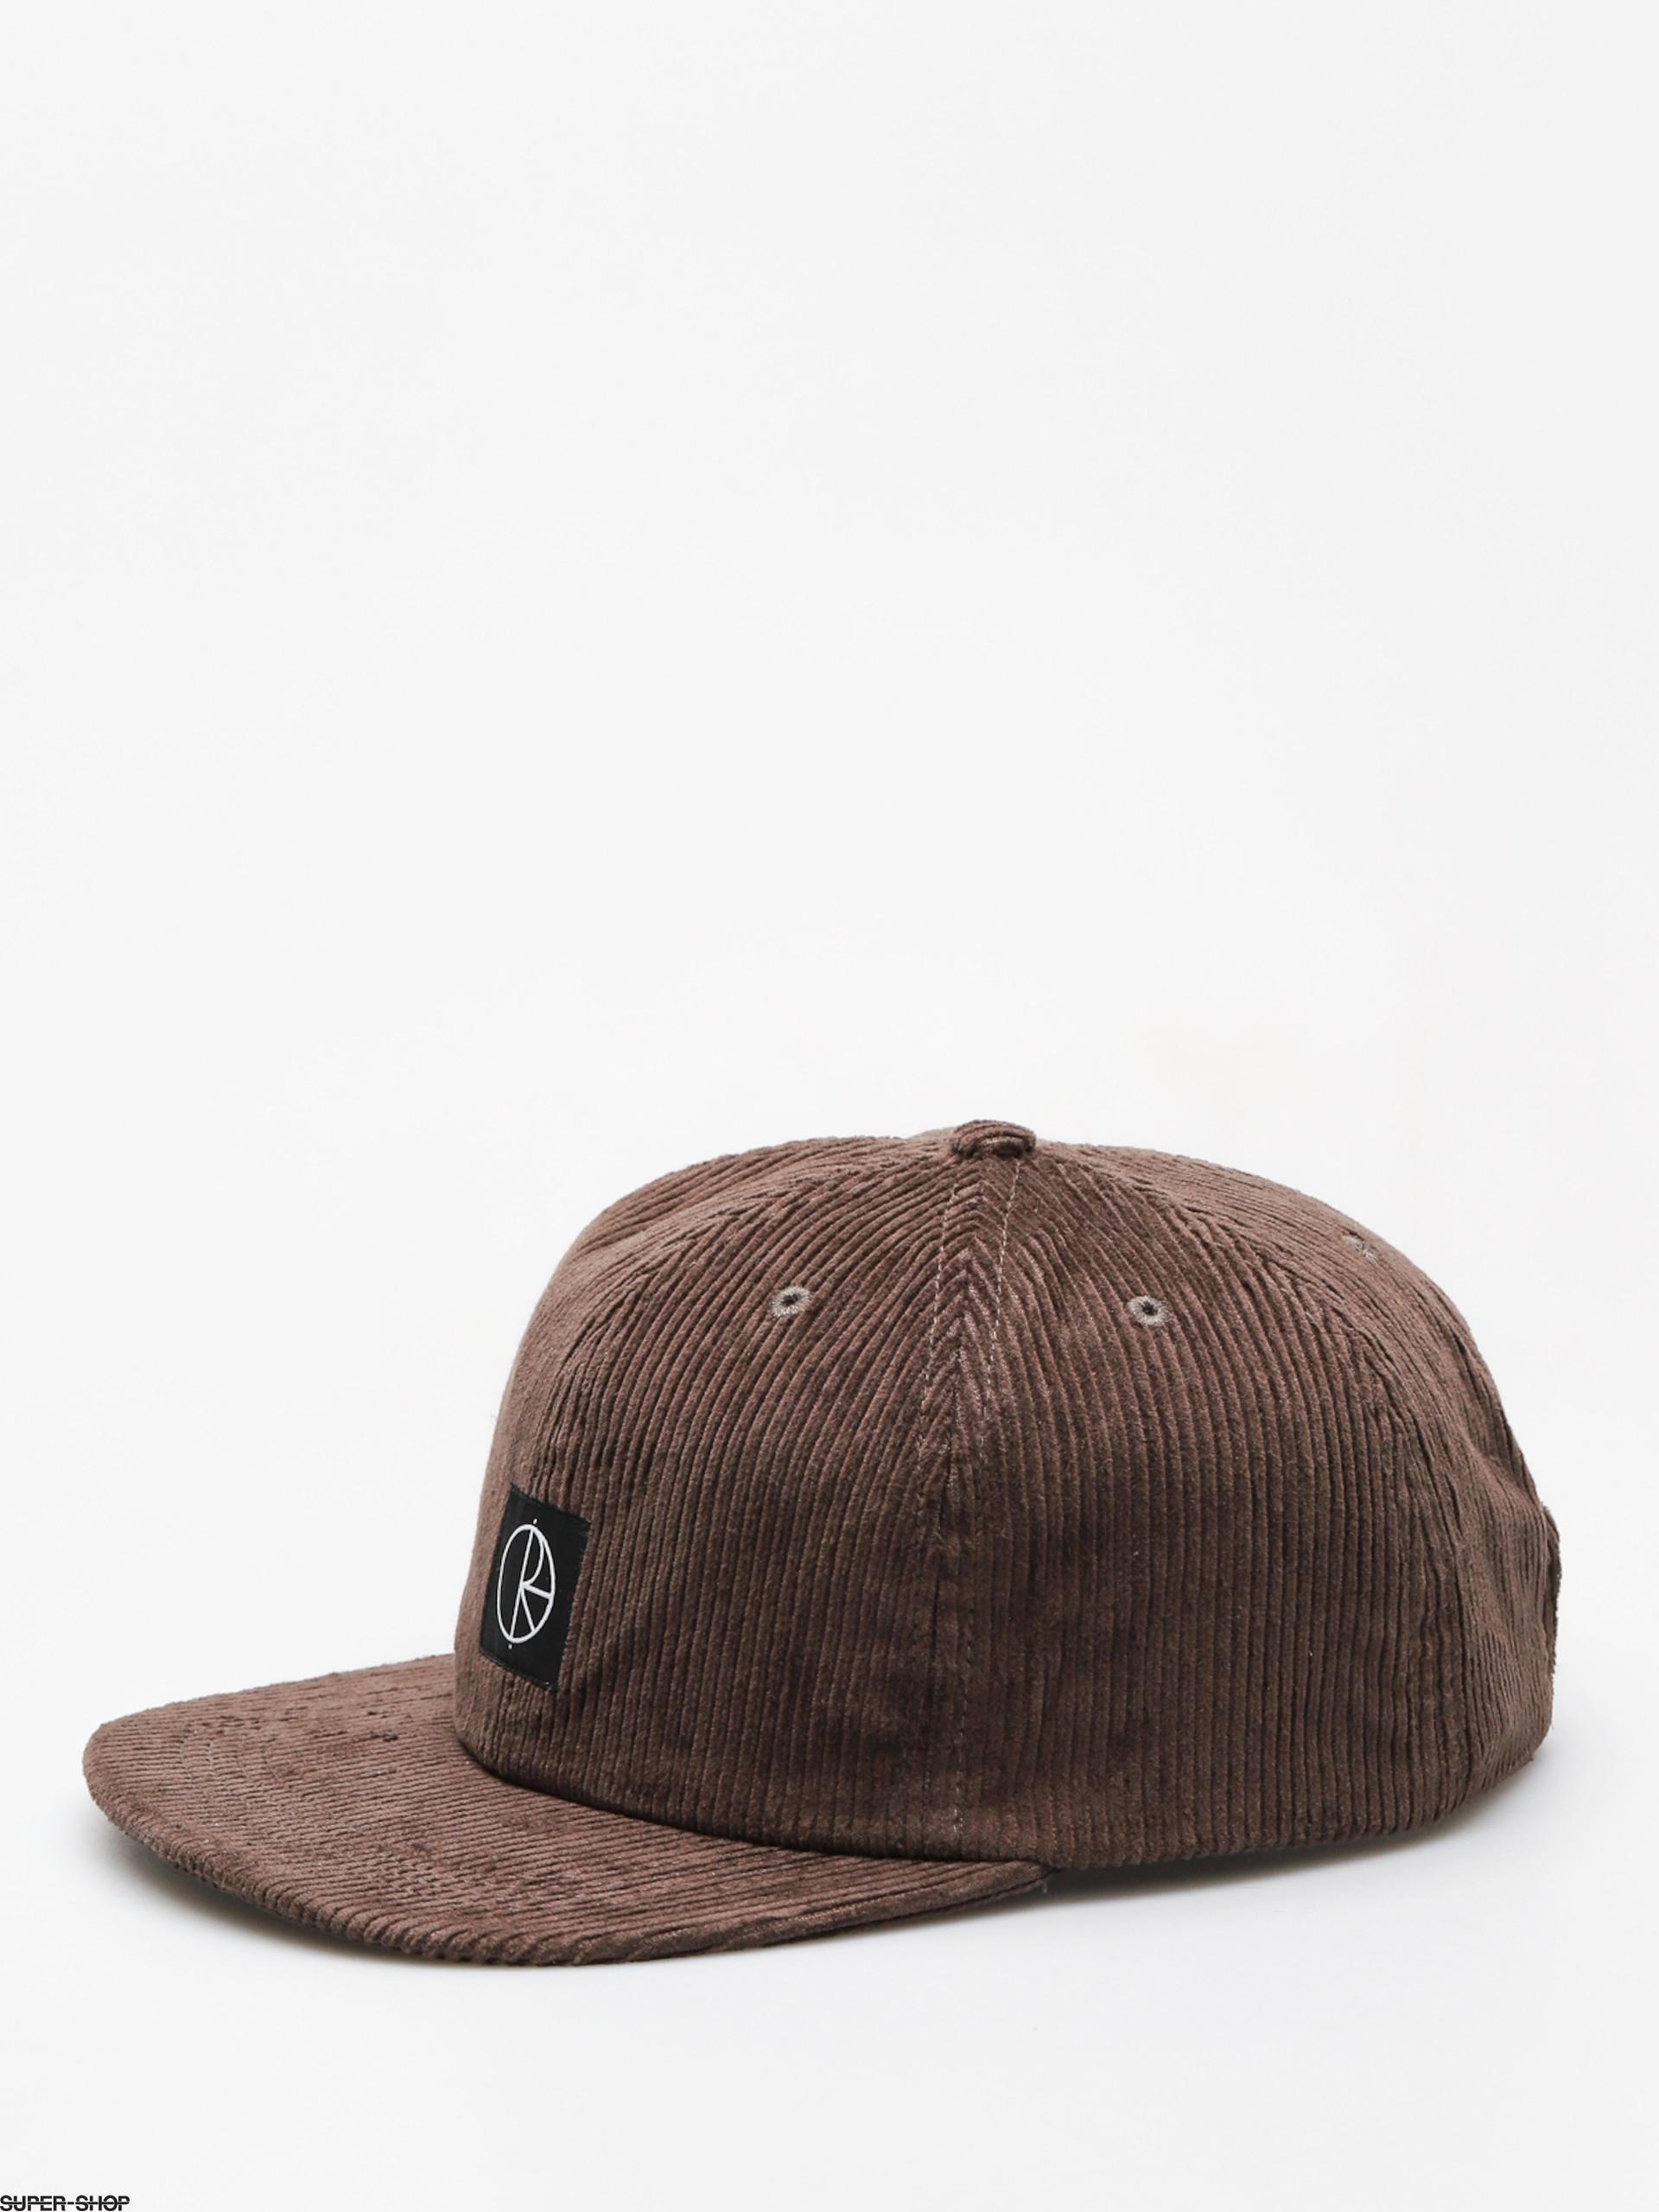 8e90e2e73b3 979949-w1920-polar-skate-cap-corduroy-brown.jpg